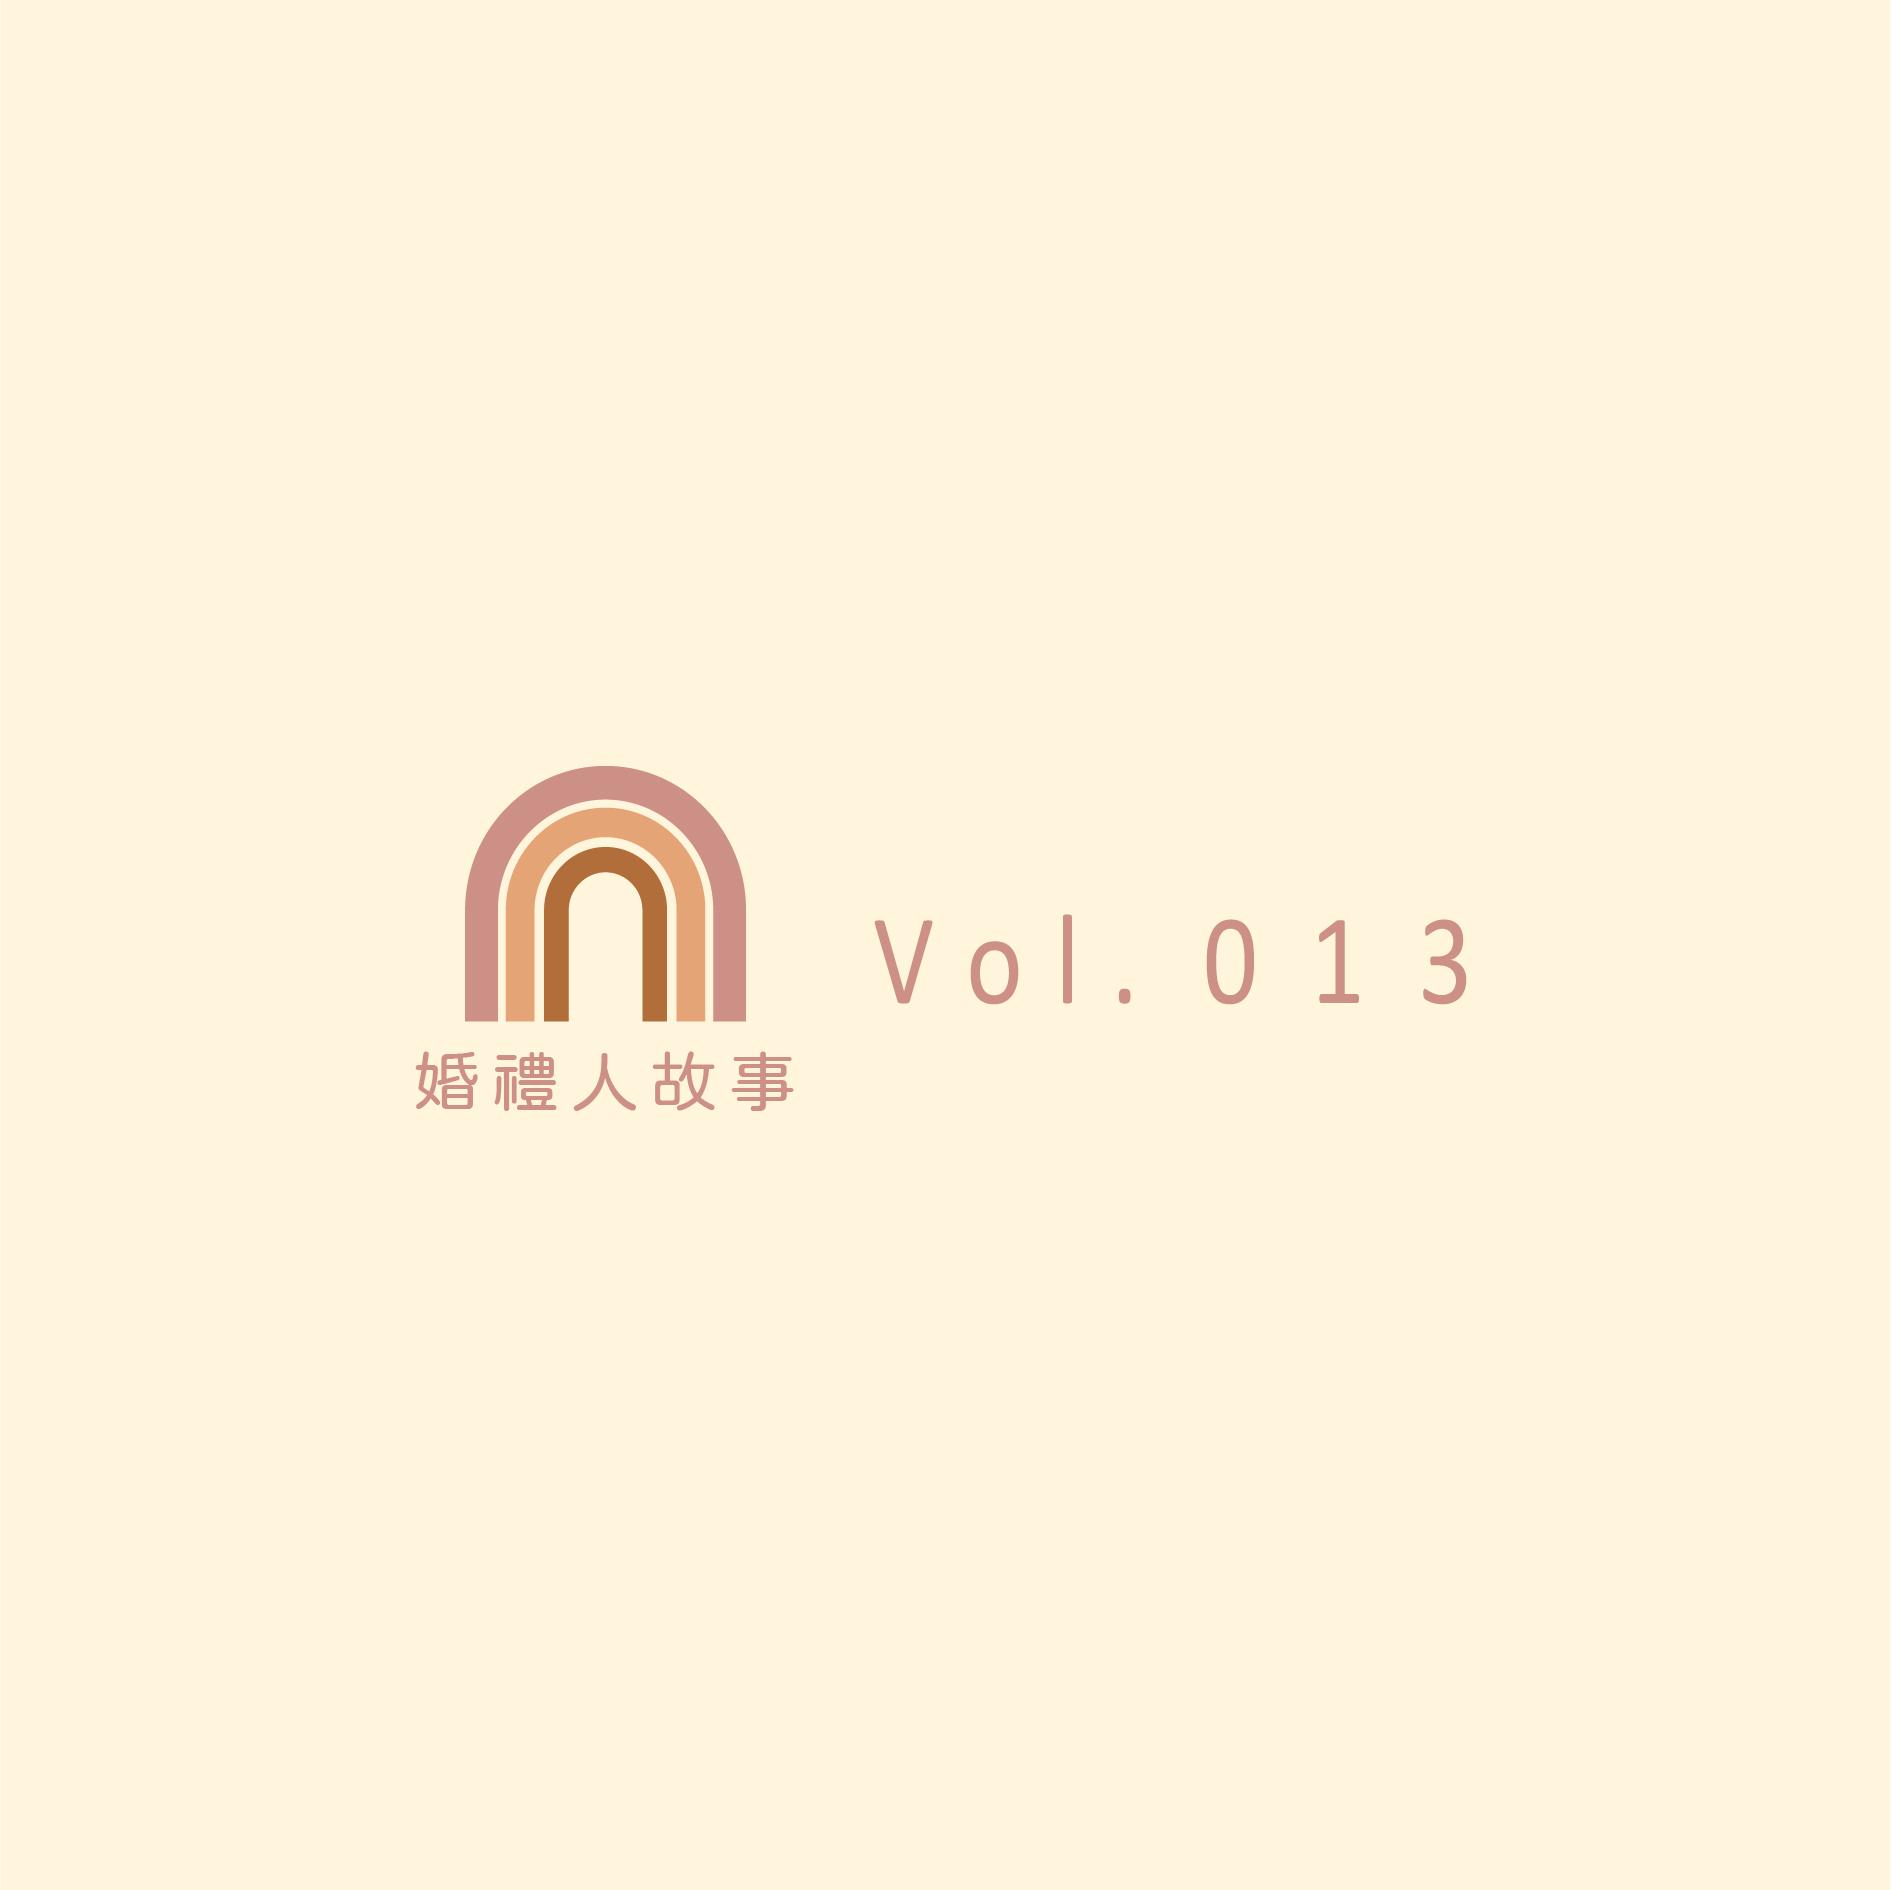 Vol.013 舉辦在麻辣火鍋店的婚禮|整理師-之琳|100種幸福